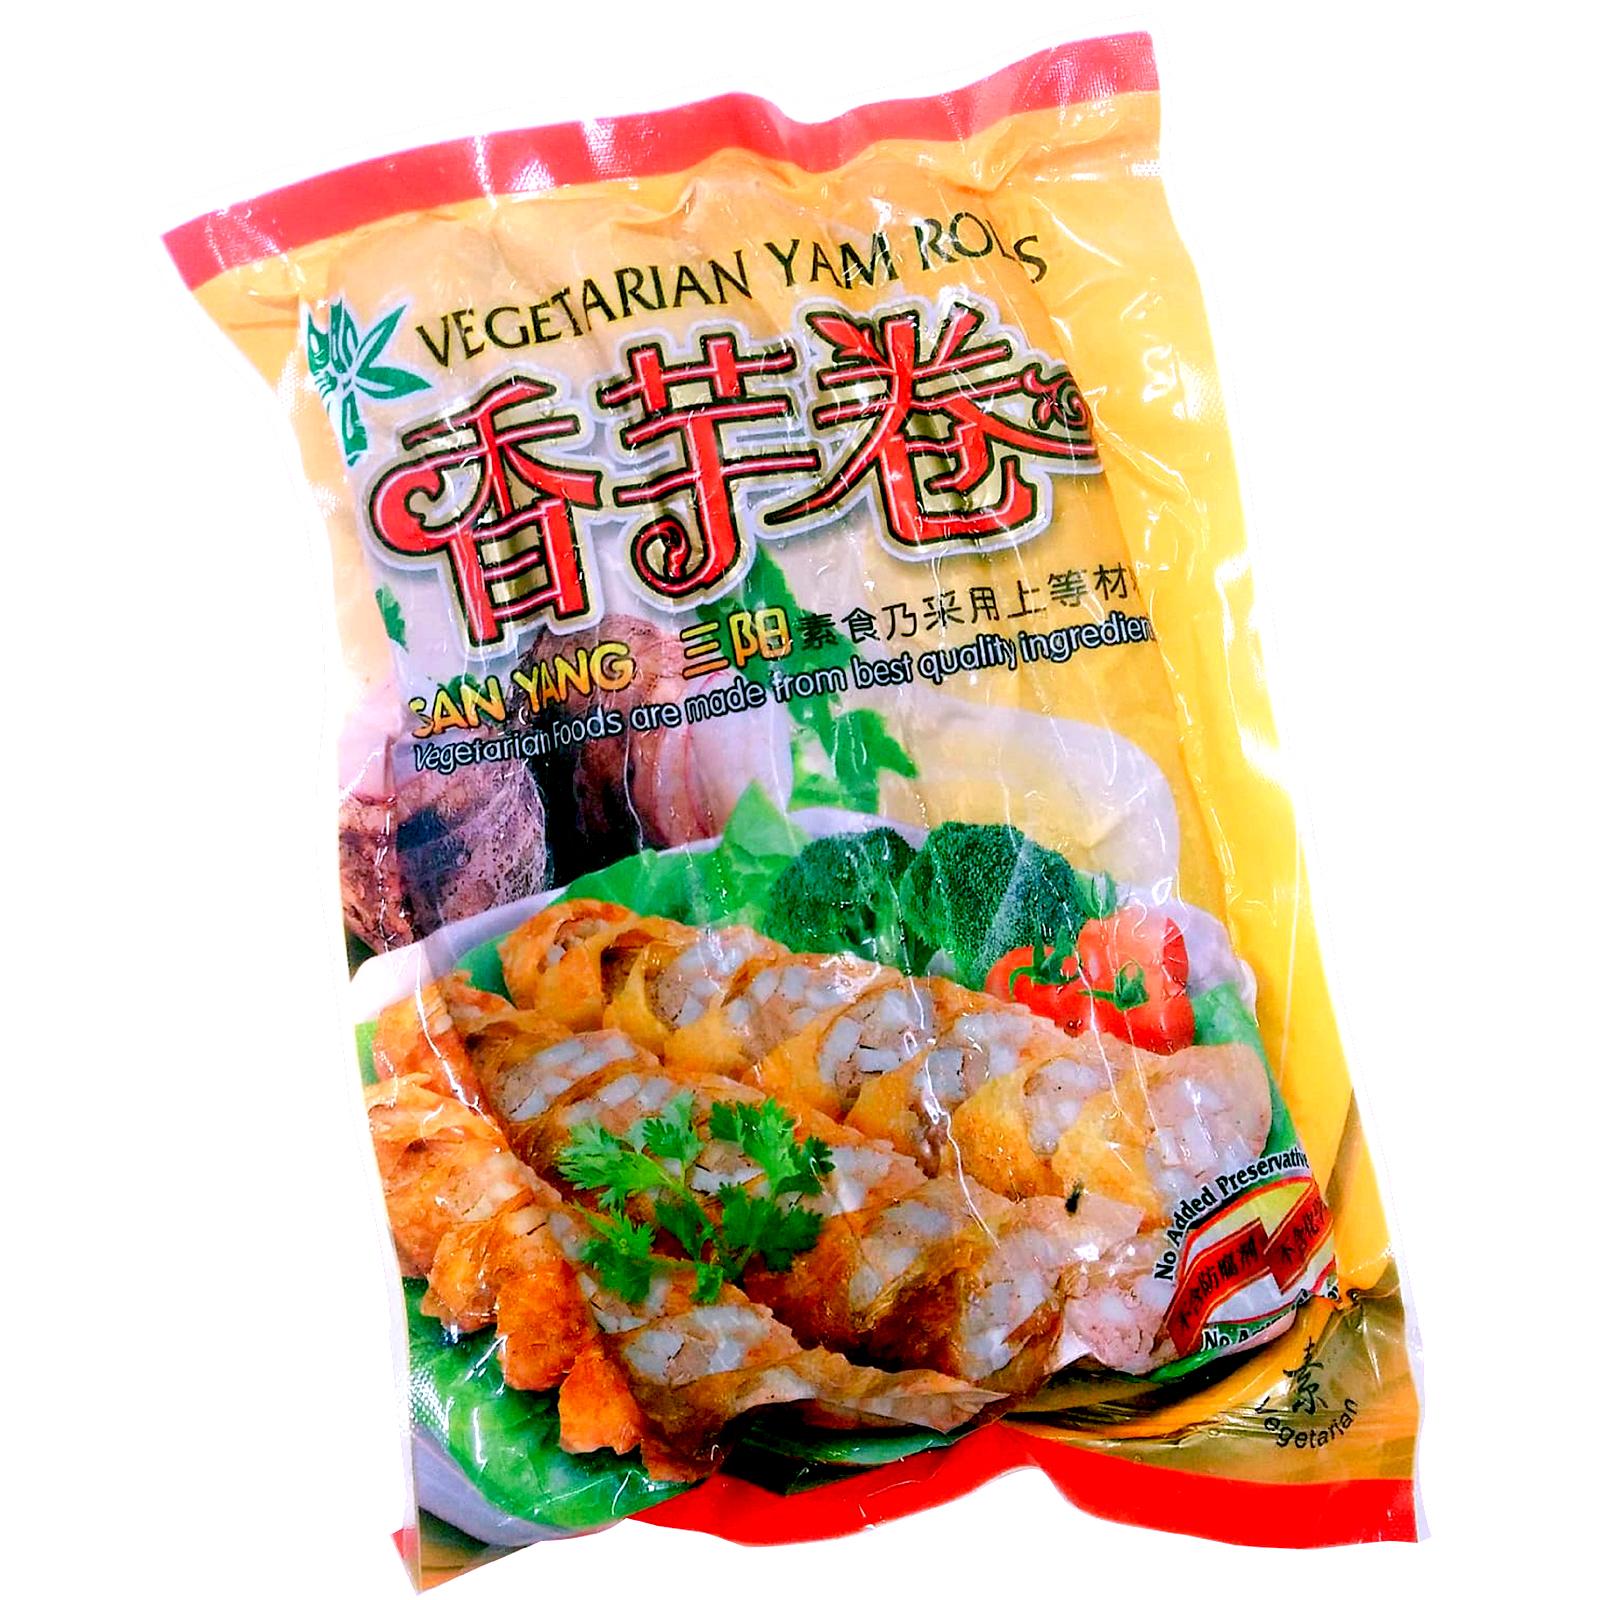 Image SY Yam Rolls 三阳 - 香芋卷 (5 pieces) 500grams